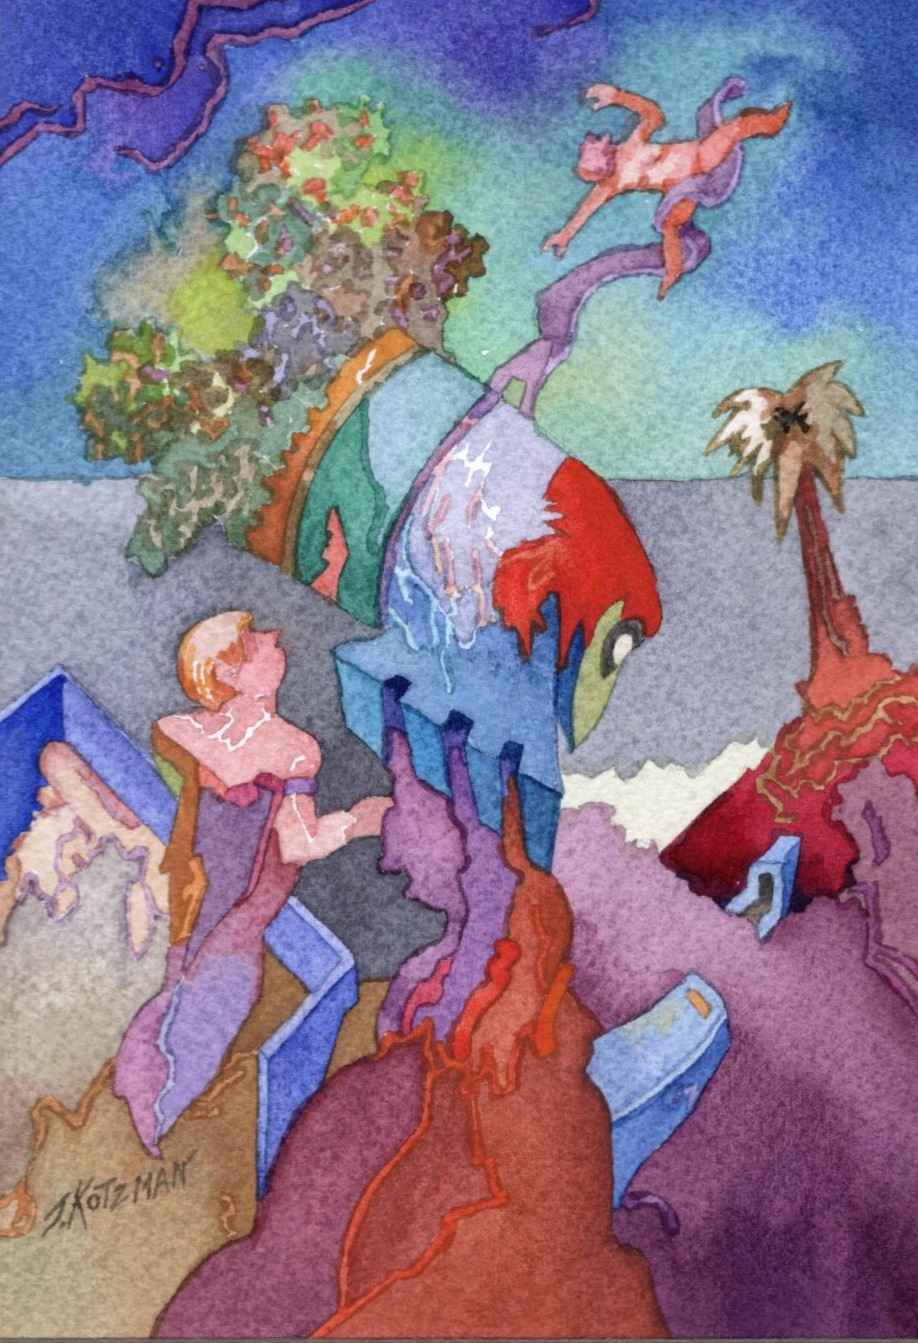 Caught in the Updraft by  Joe Kotzman - Masterpiece Online